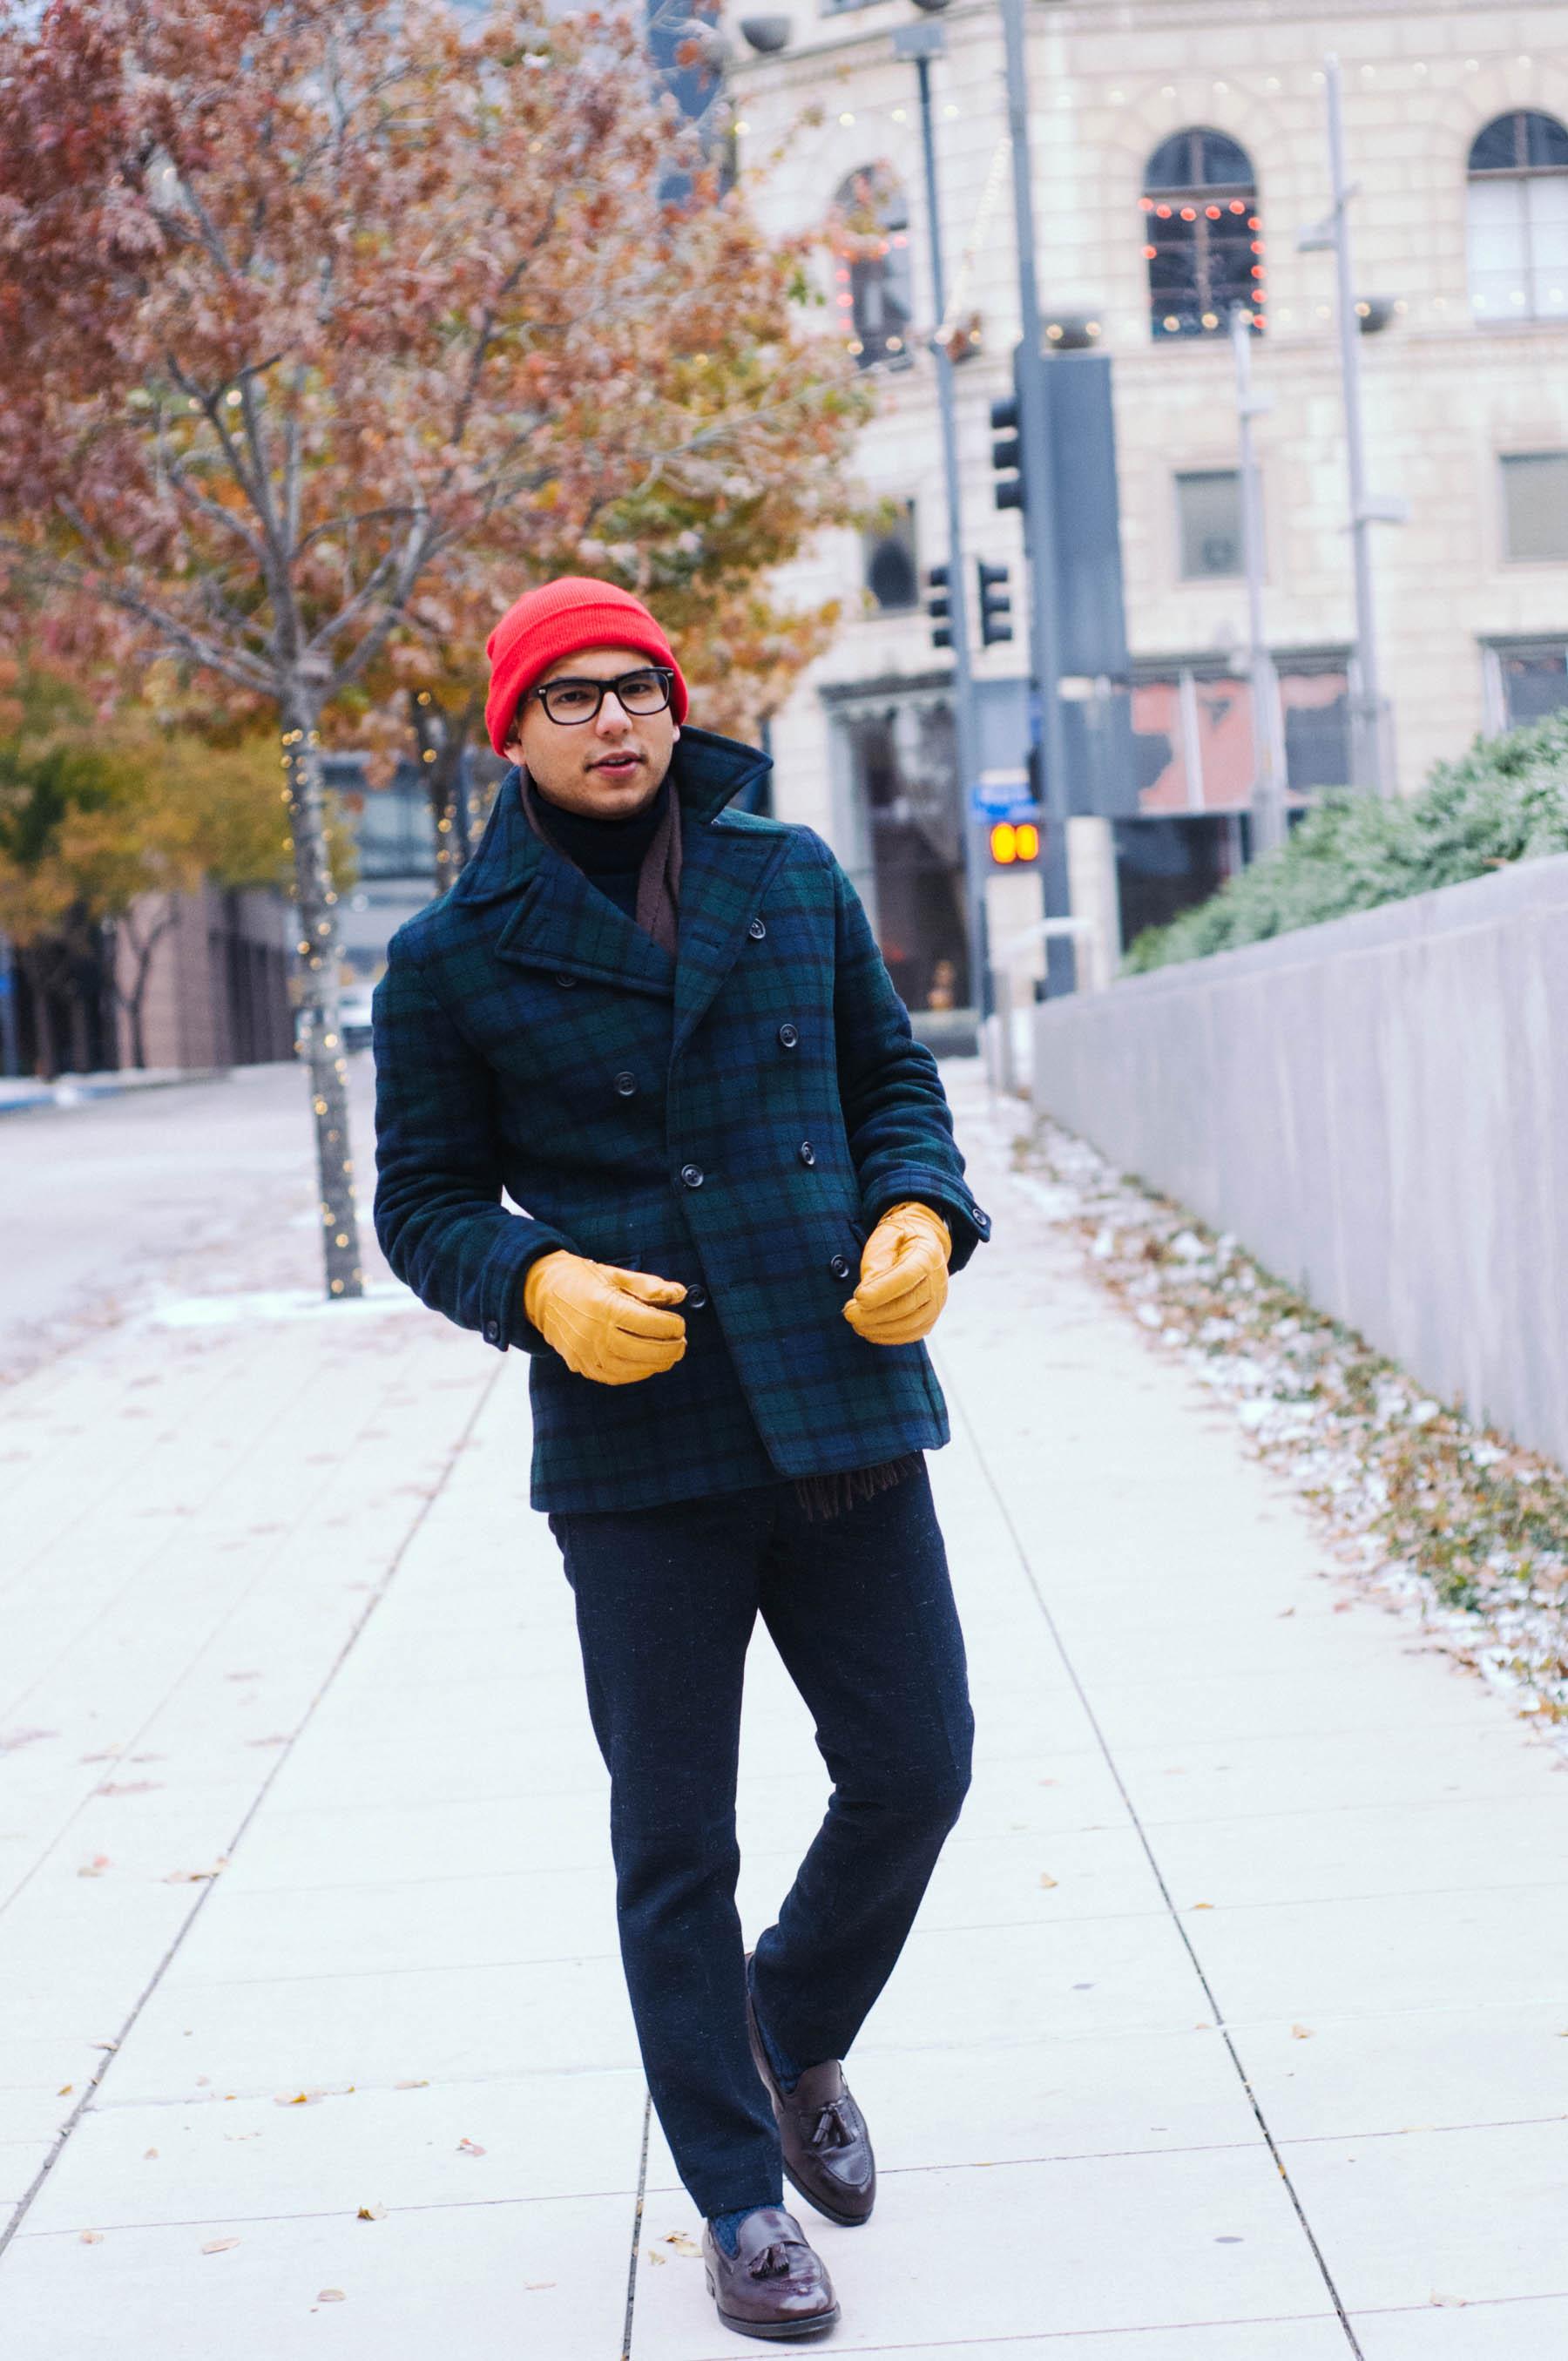 Coat: UNIQLO| Pants: H&M | Turtleneck: J.Crew | Shoes: Alden (similar  here ) | Scarf: Merona |Socks: J.Crew | Glasses: Warby Parker (similar  here ) | Gloves: Jack Spade Watch: Aeromatic 1912